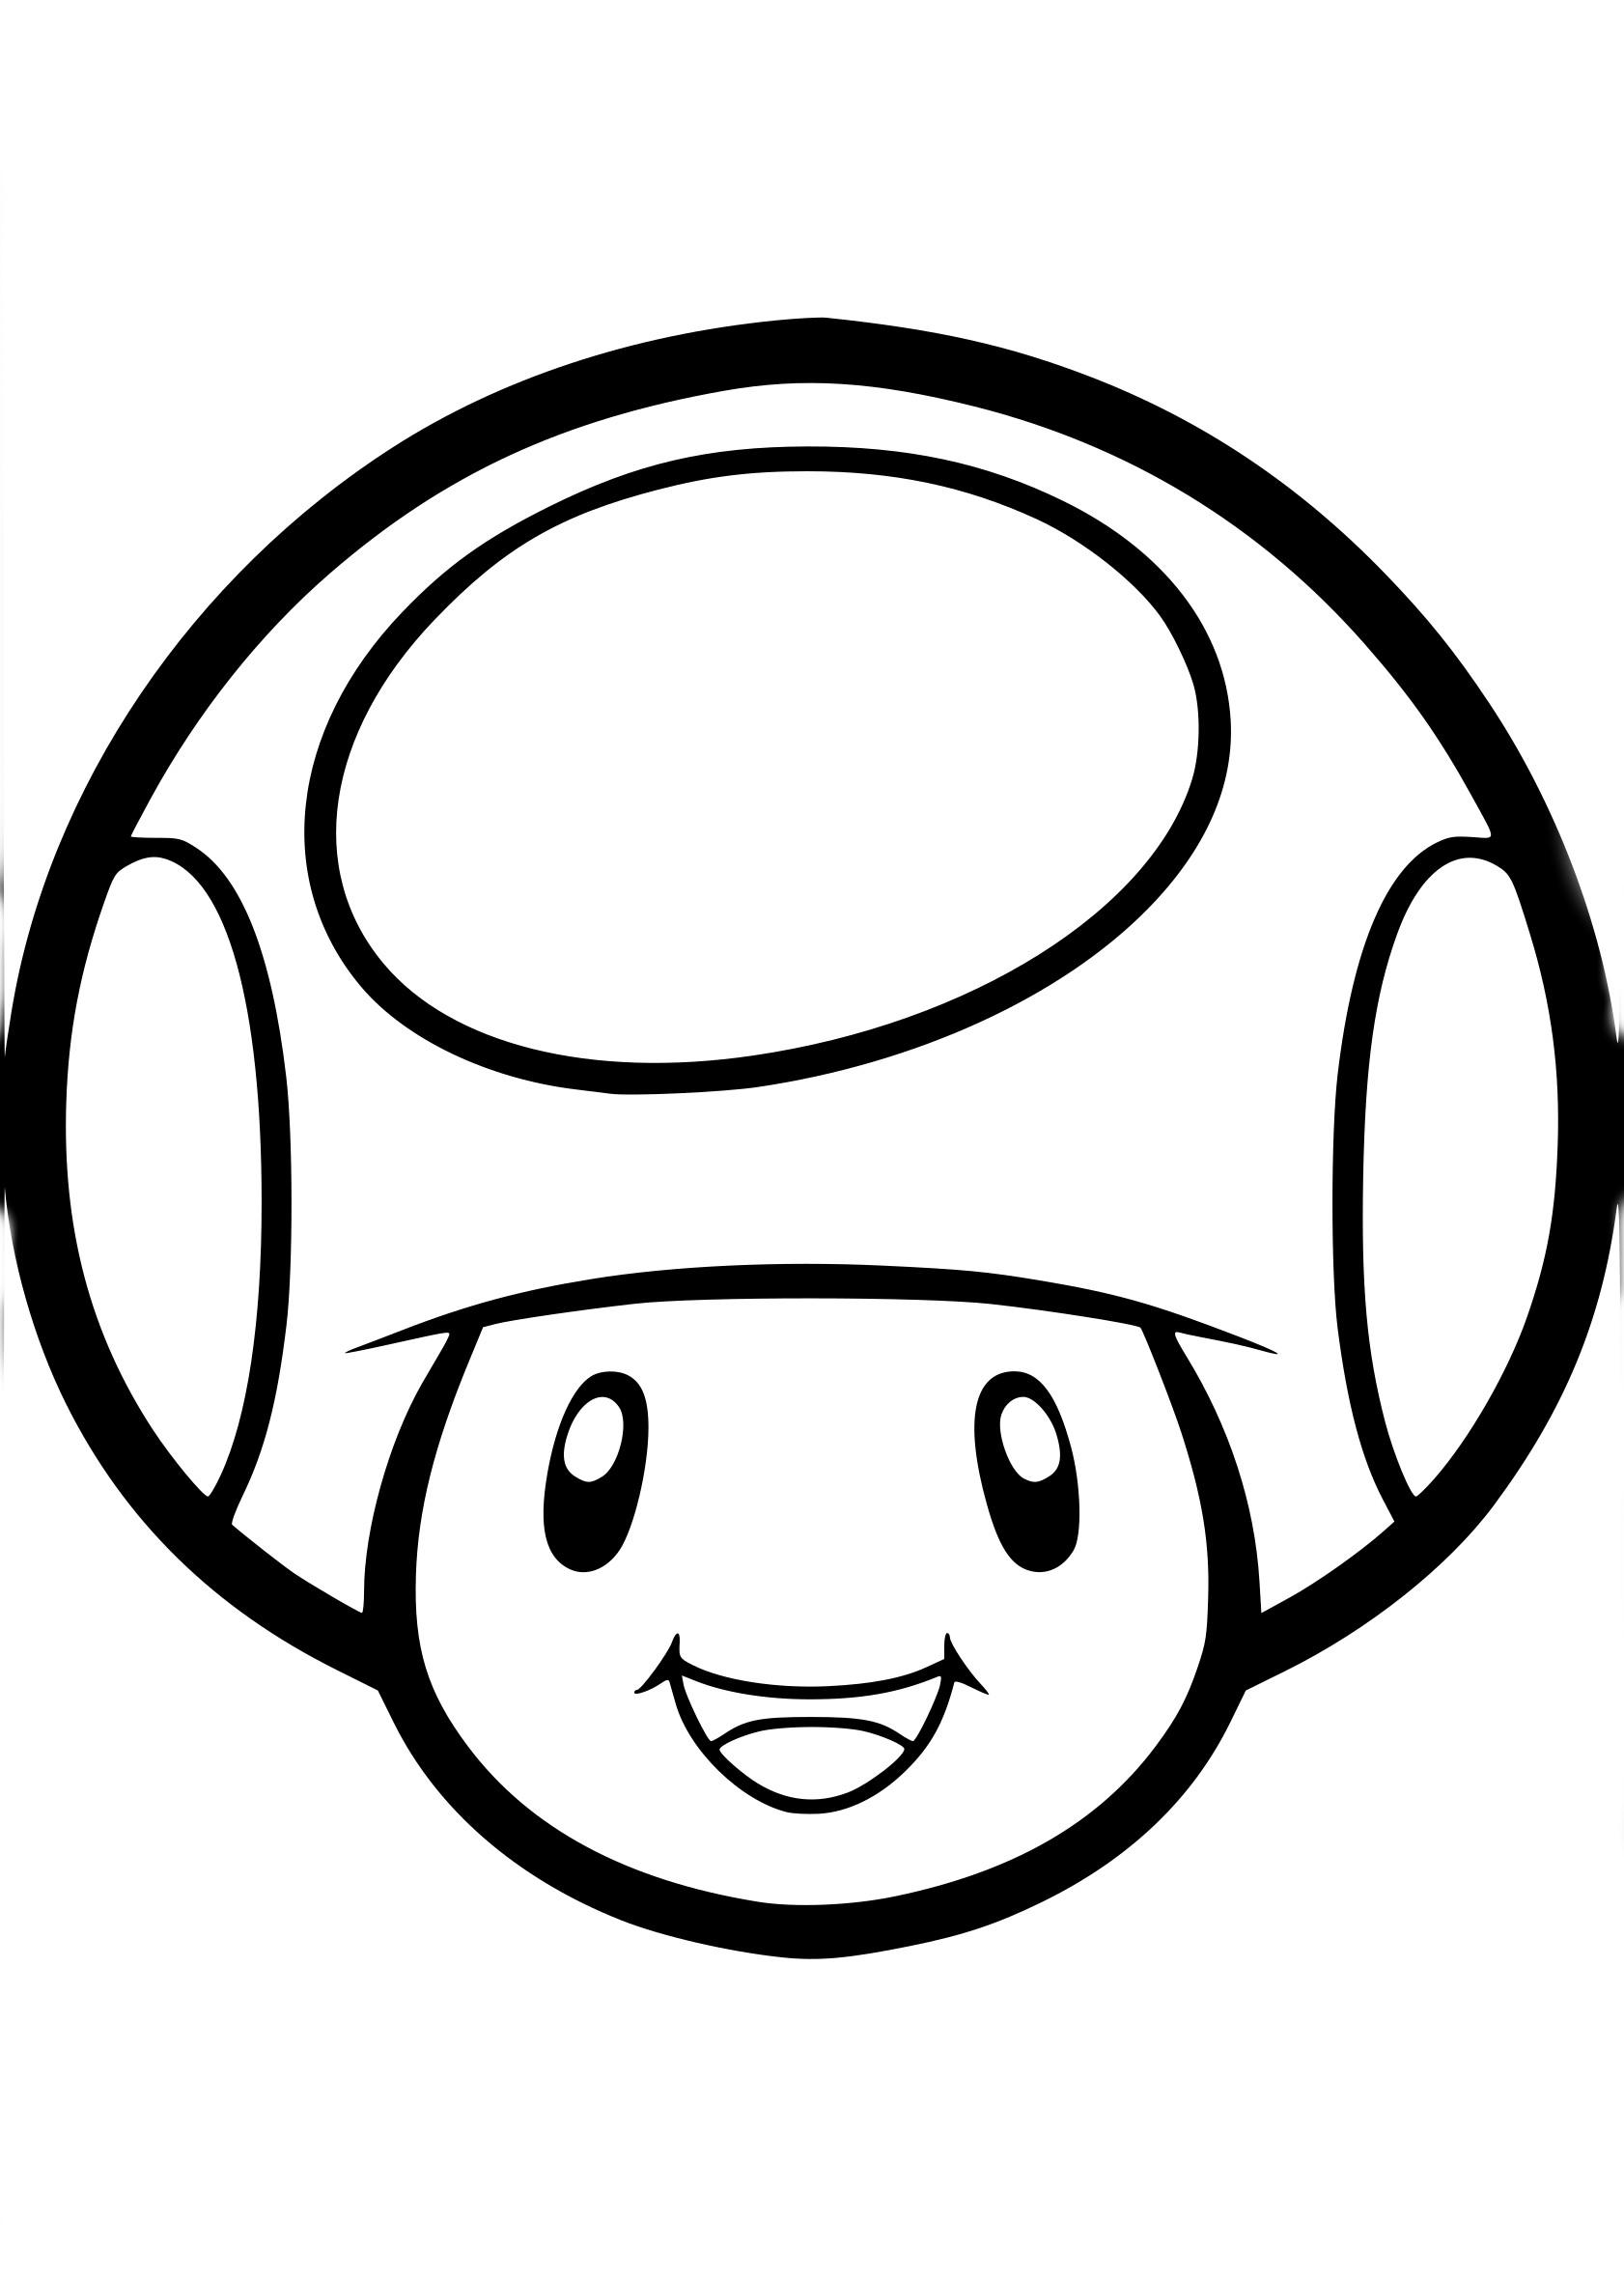 Coloriage Champignon Mario à Imprimer